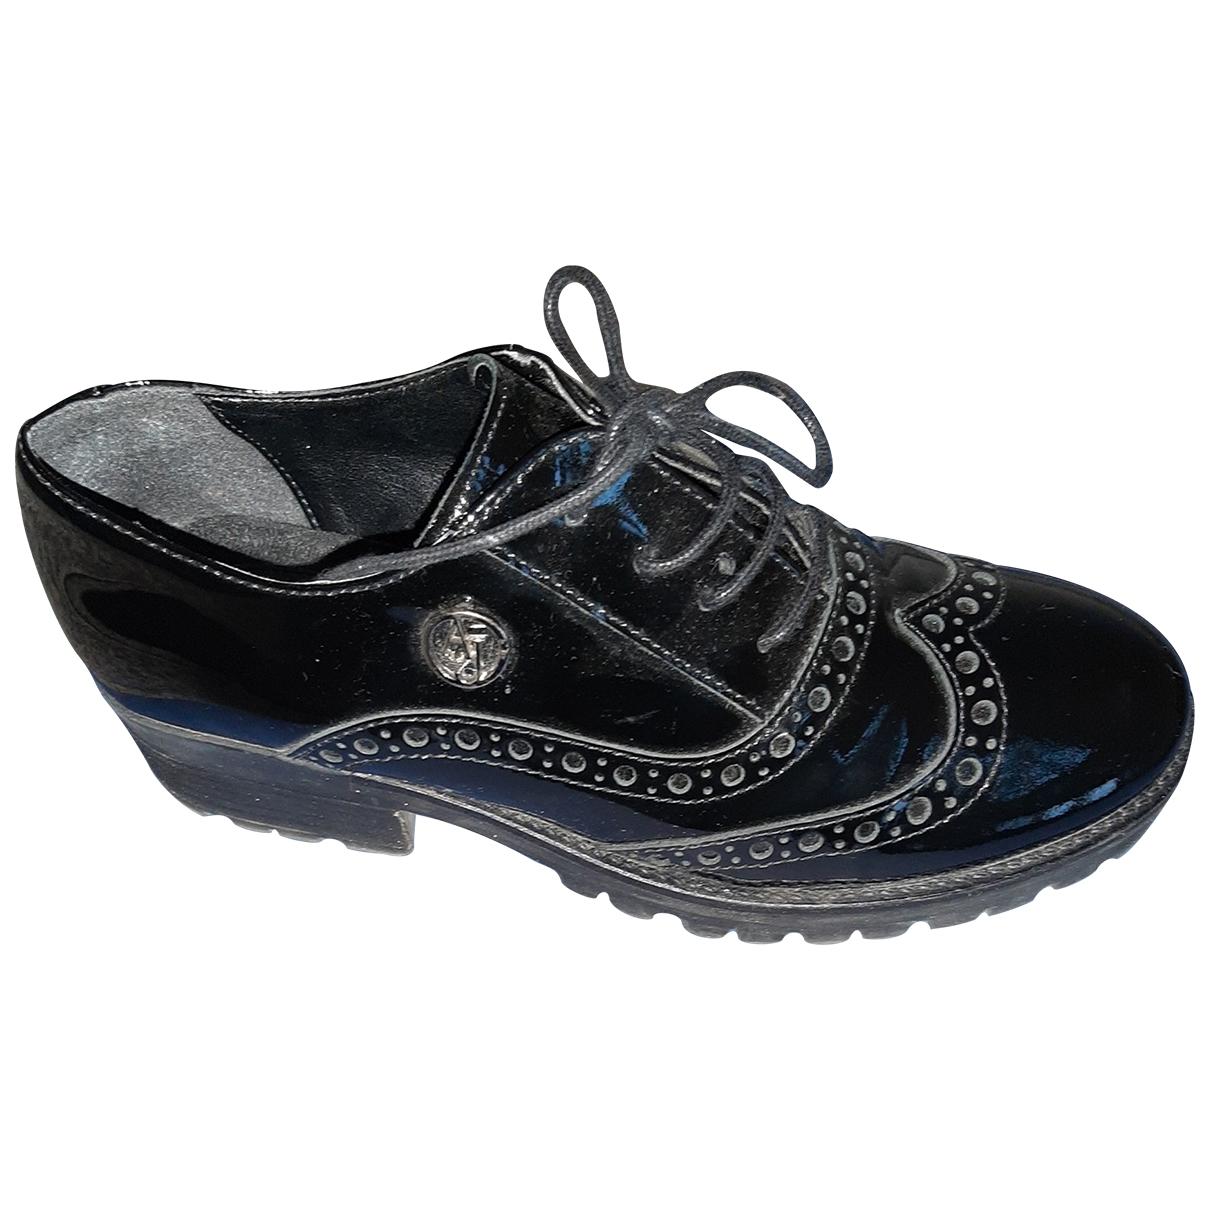 Emporio Armani \N Black Patent leather Lace ups for Women 38 EU